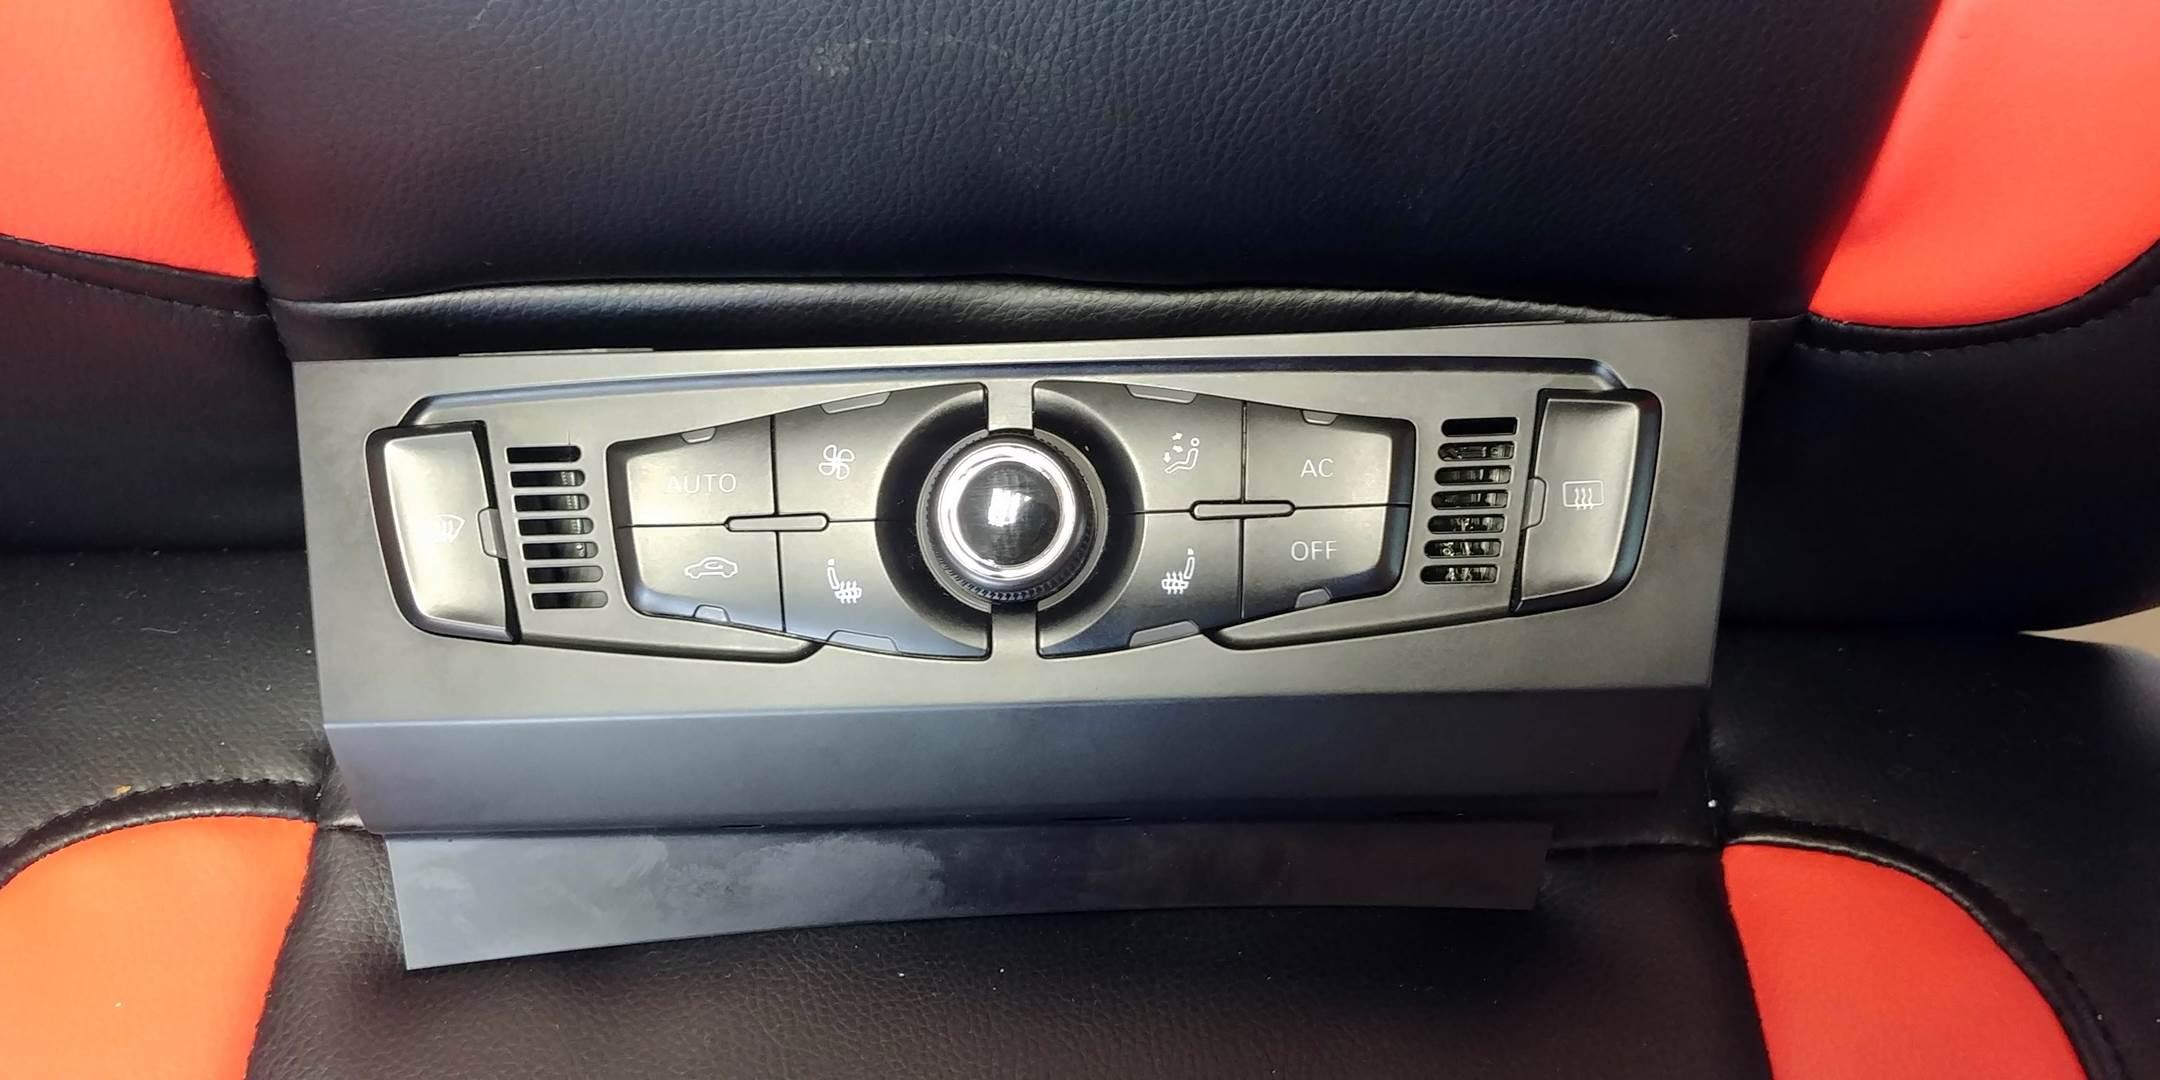 panel klimatyzacji Audi 8t1820043